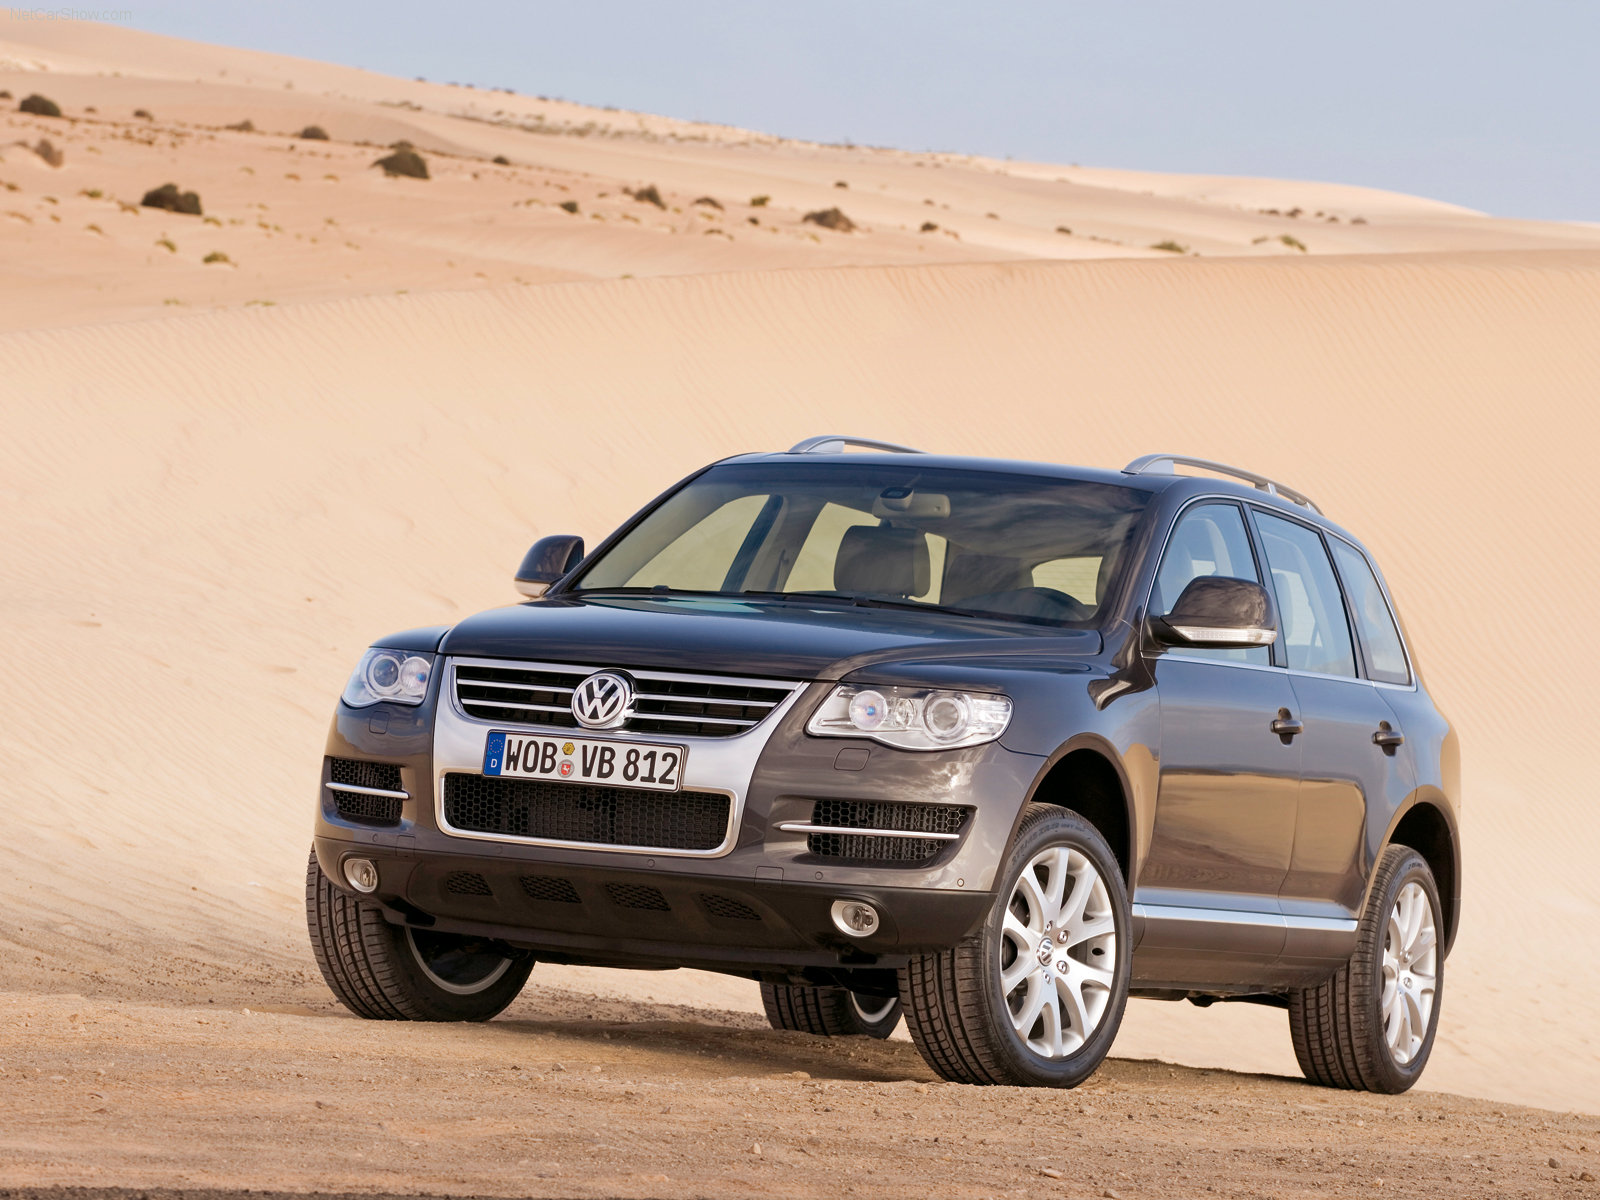 http://w04.ru/foto/Volkswagen-Touareg_2007_1600x1200_wallpaper_03.jpg